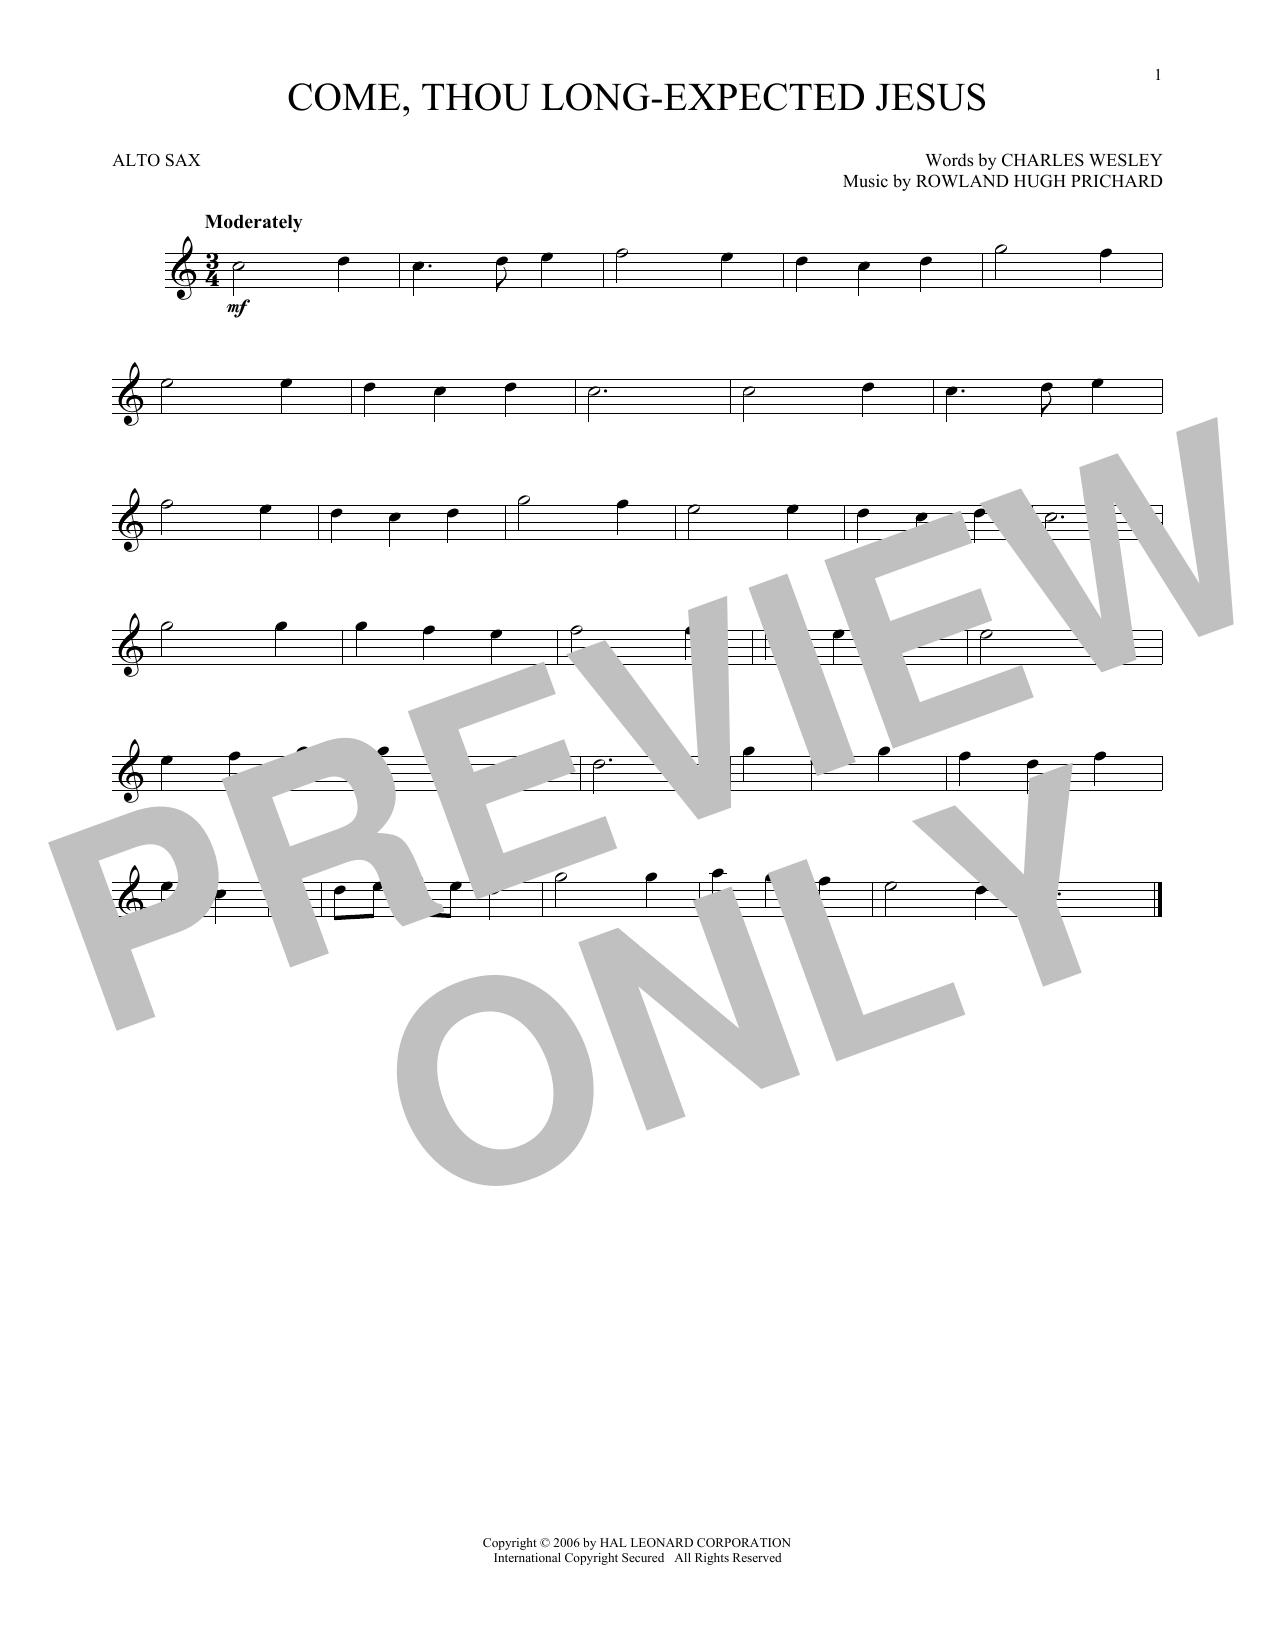 Come, Thou Long-Expected Jesus (Alto Sax Solo)